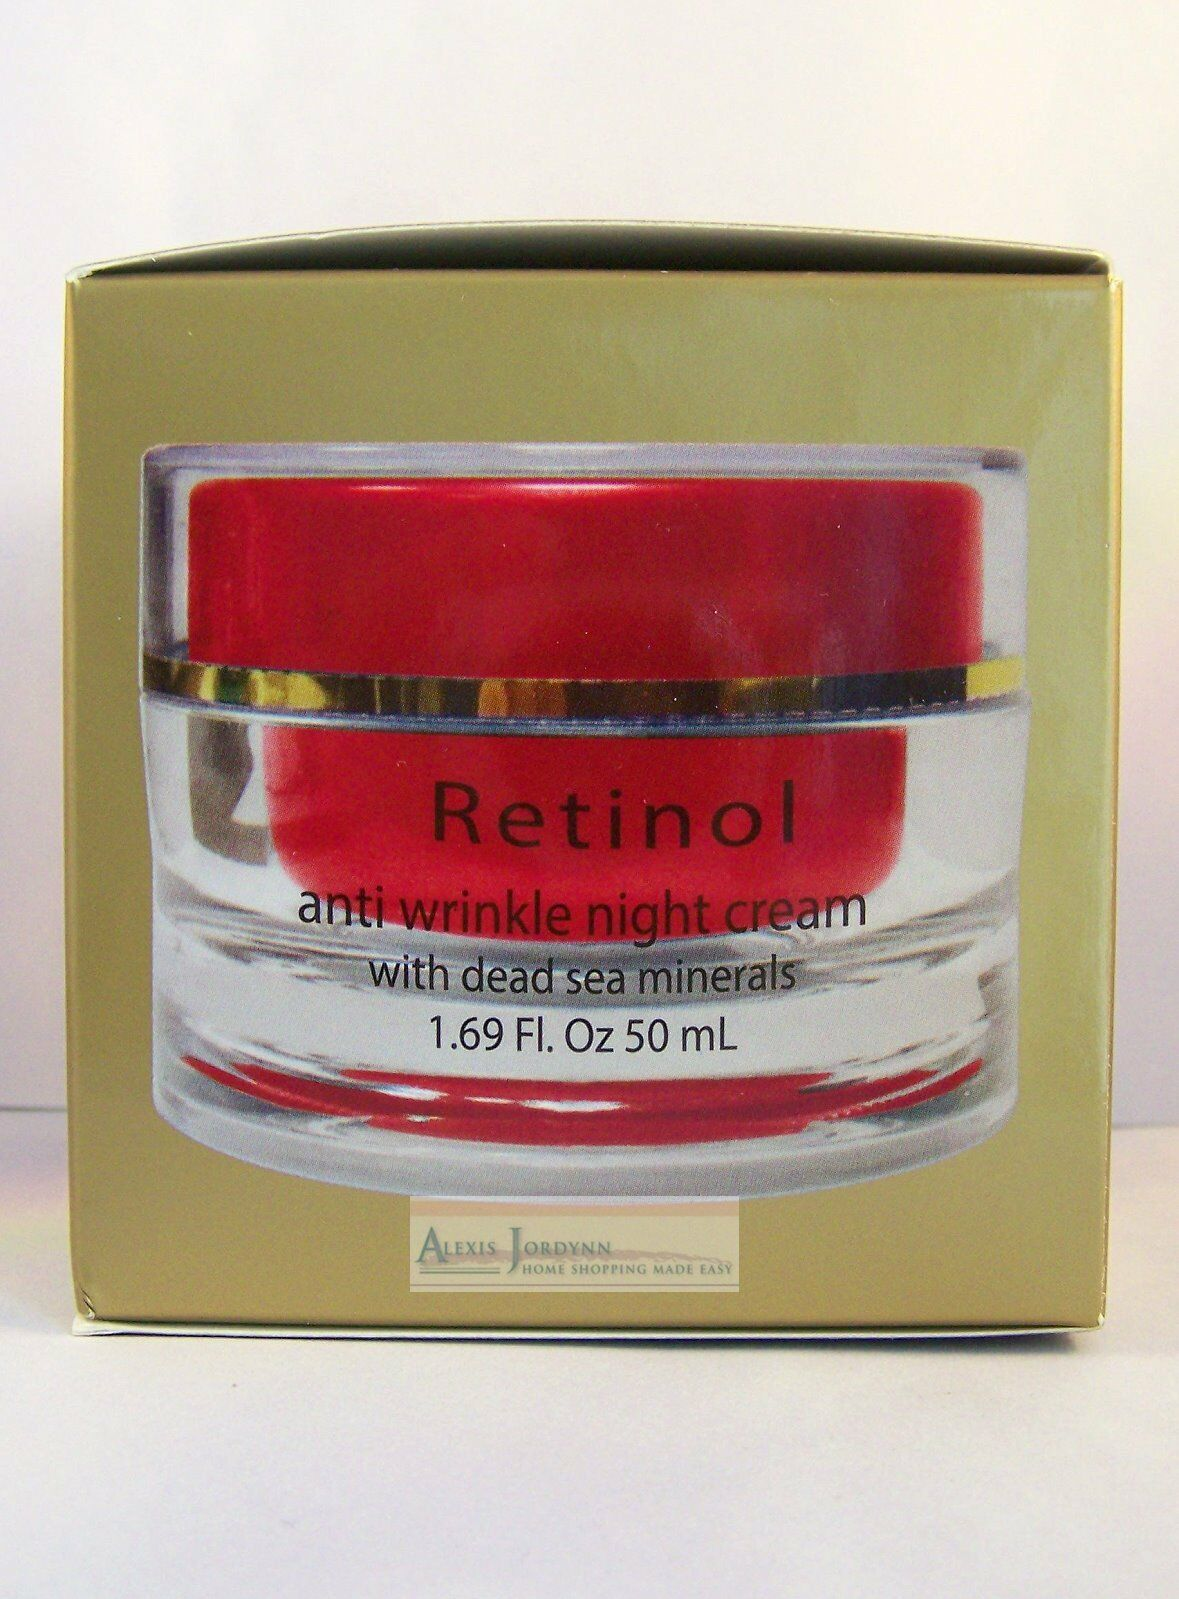 Dead Sea Collection & Retinol Anti Wrinkle Night Creams - Va